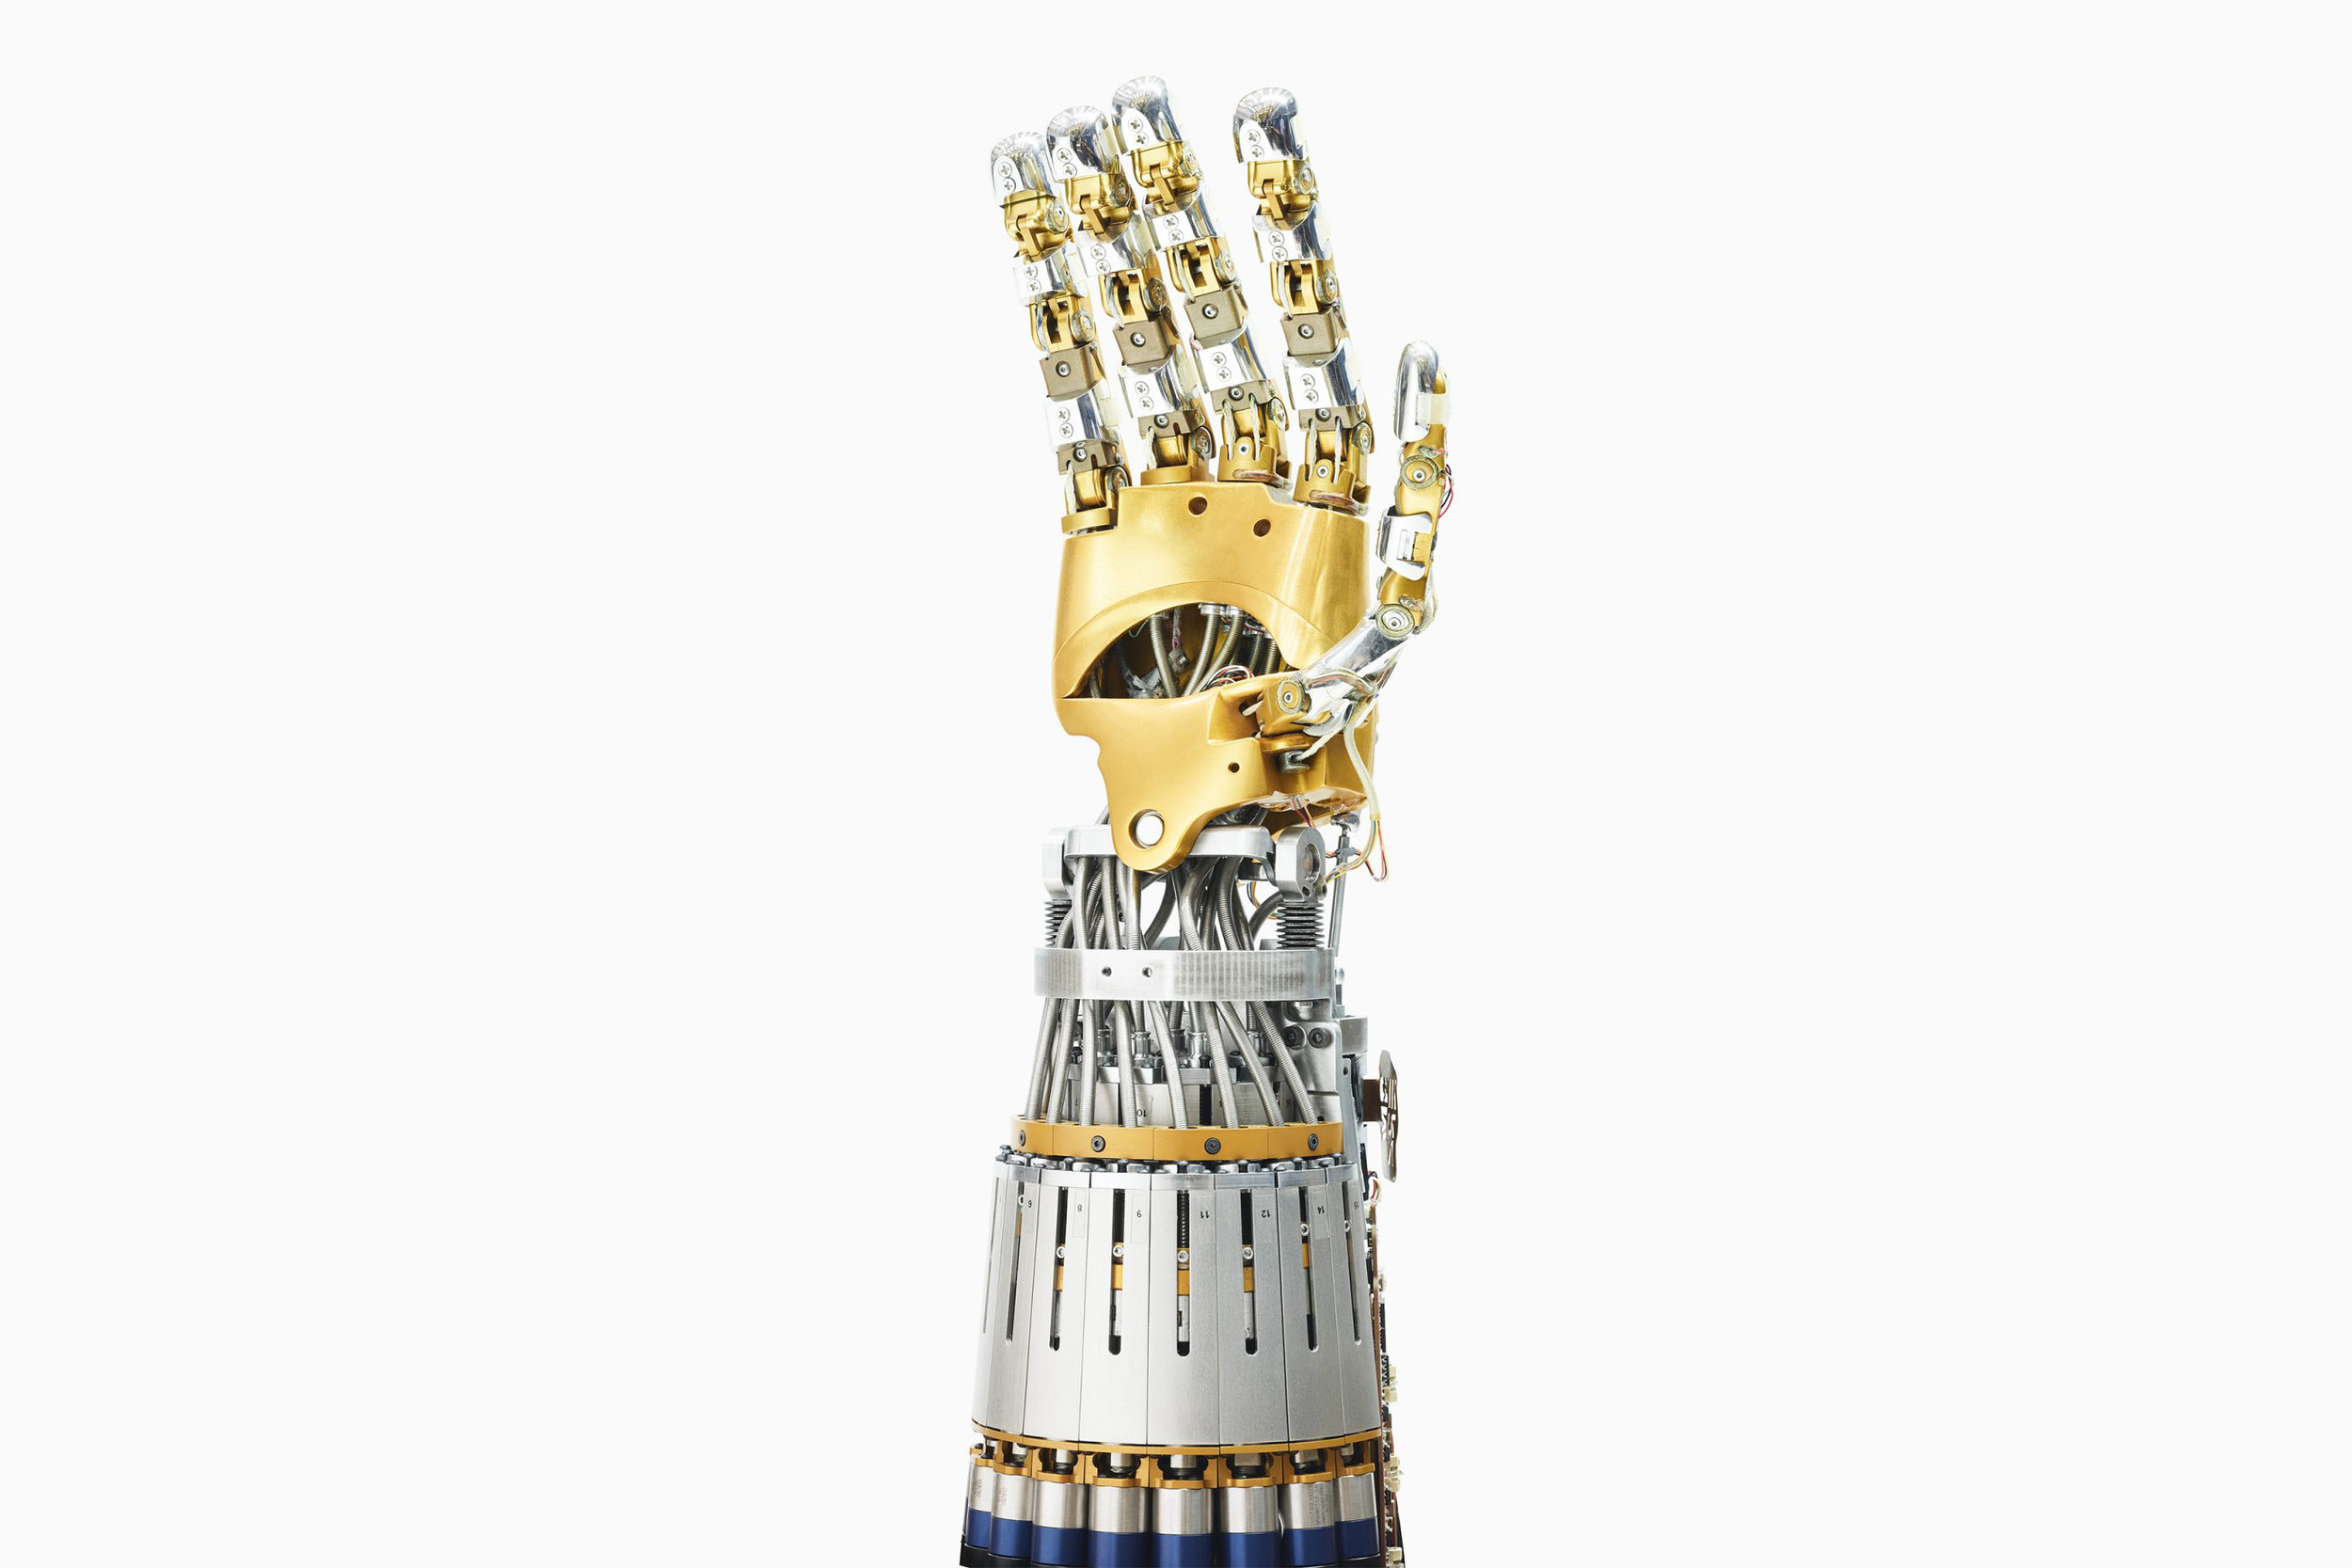 20160720_JSC_Robo_Rover_R2-Hand_Twisted_Rev_A-1920x2400.jpg